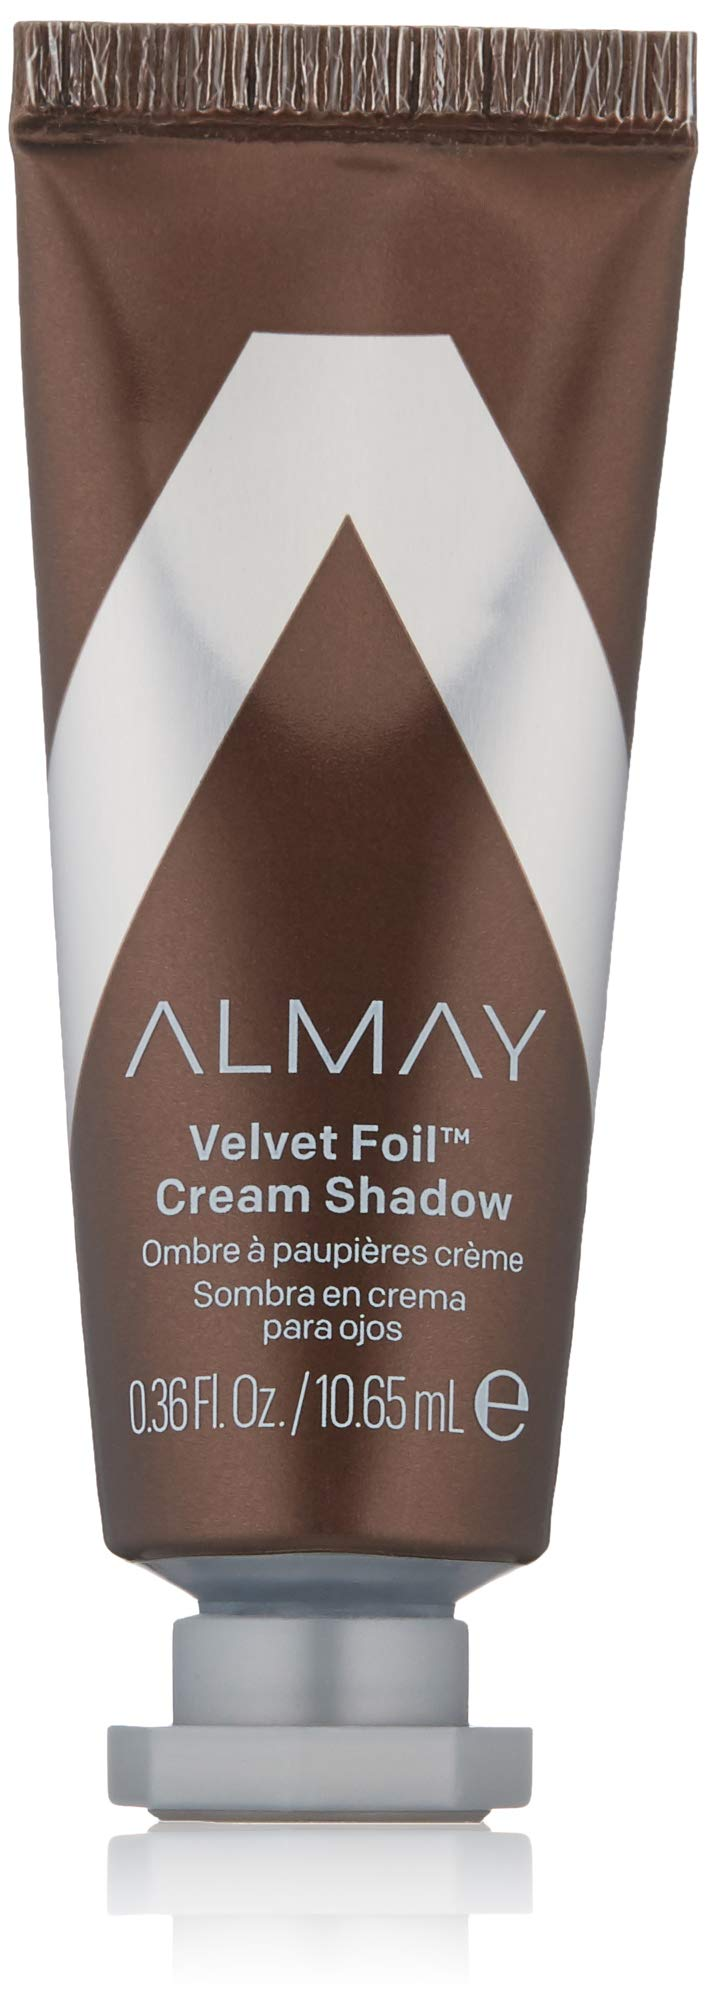 Almay Velvet Foil Cream Shadow, End Game, 0.36 fl. oz, metallic eyeshadow